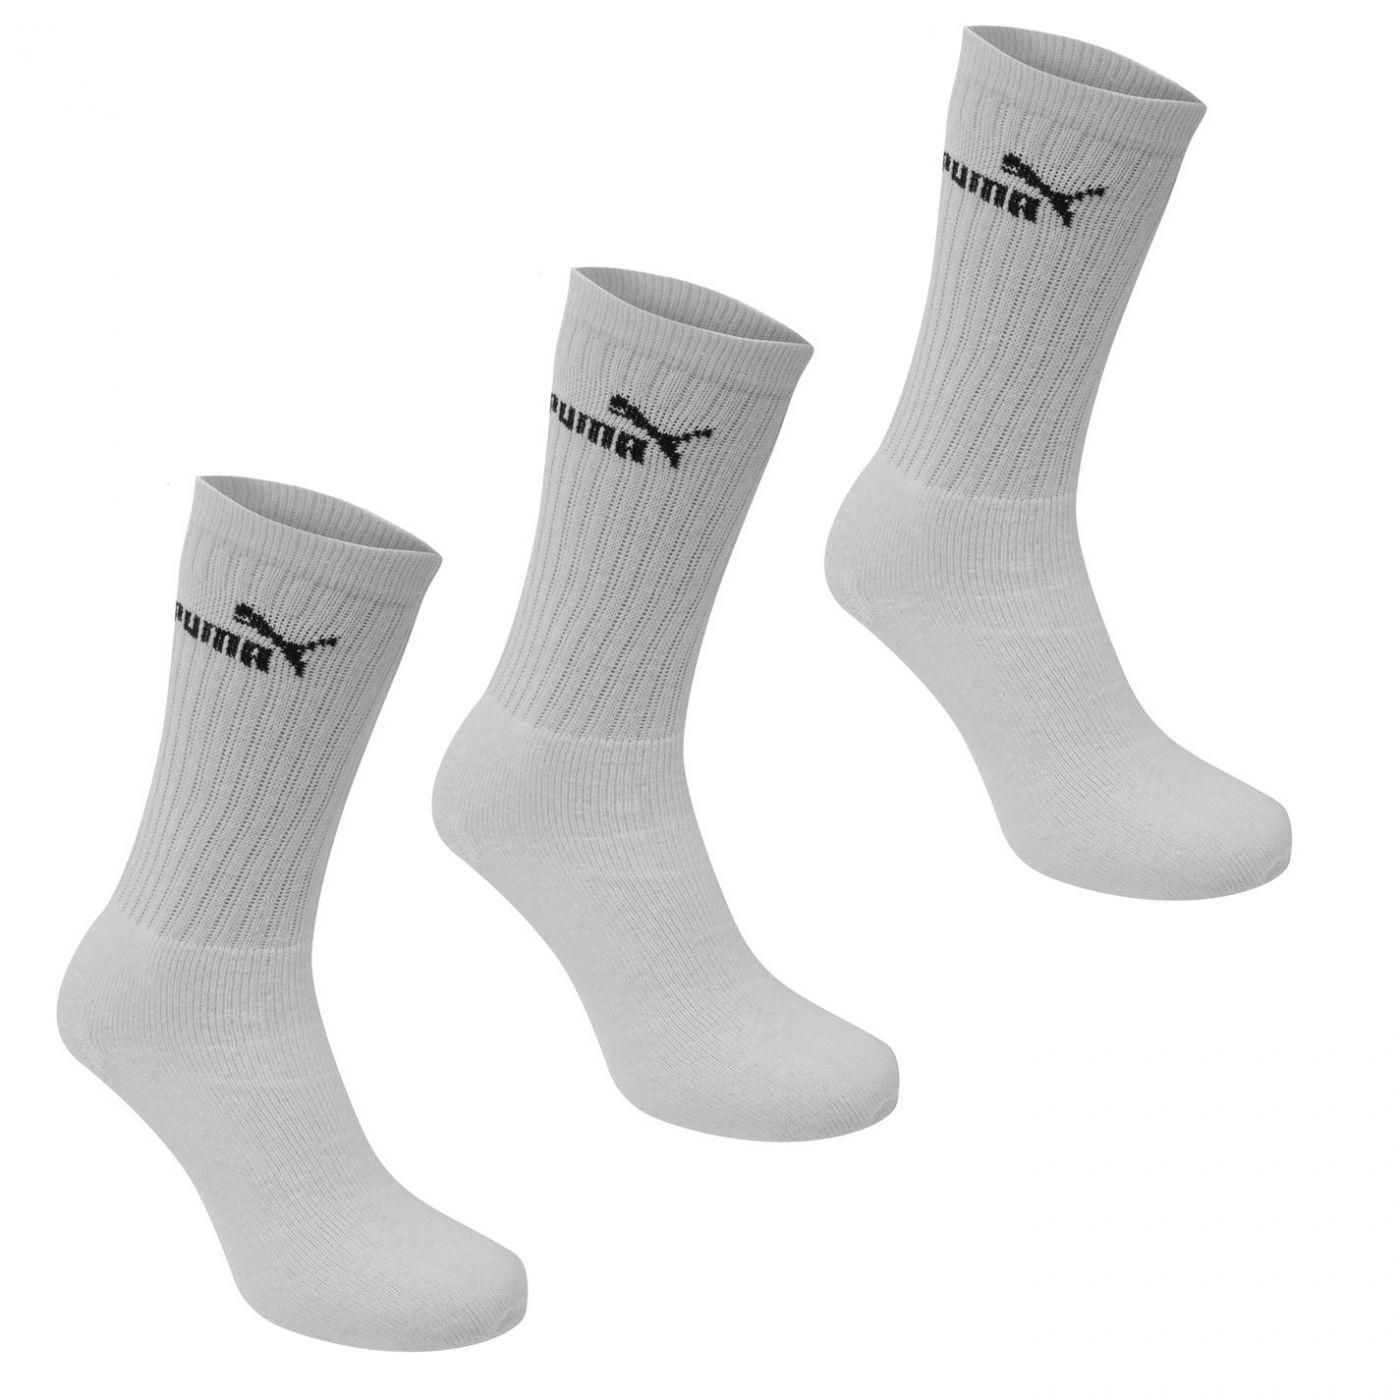 Puma 3 Pack Crew Socks Mens